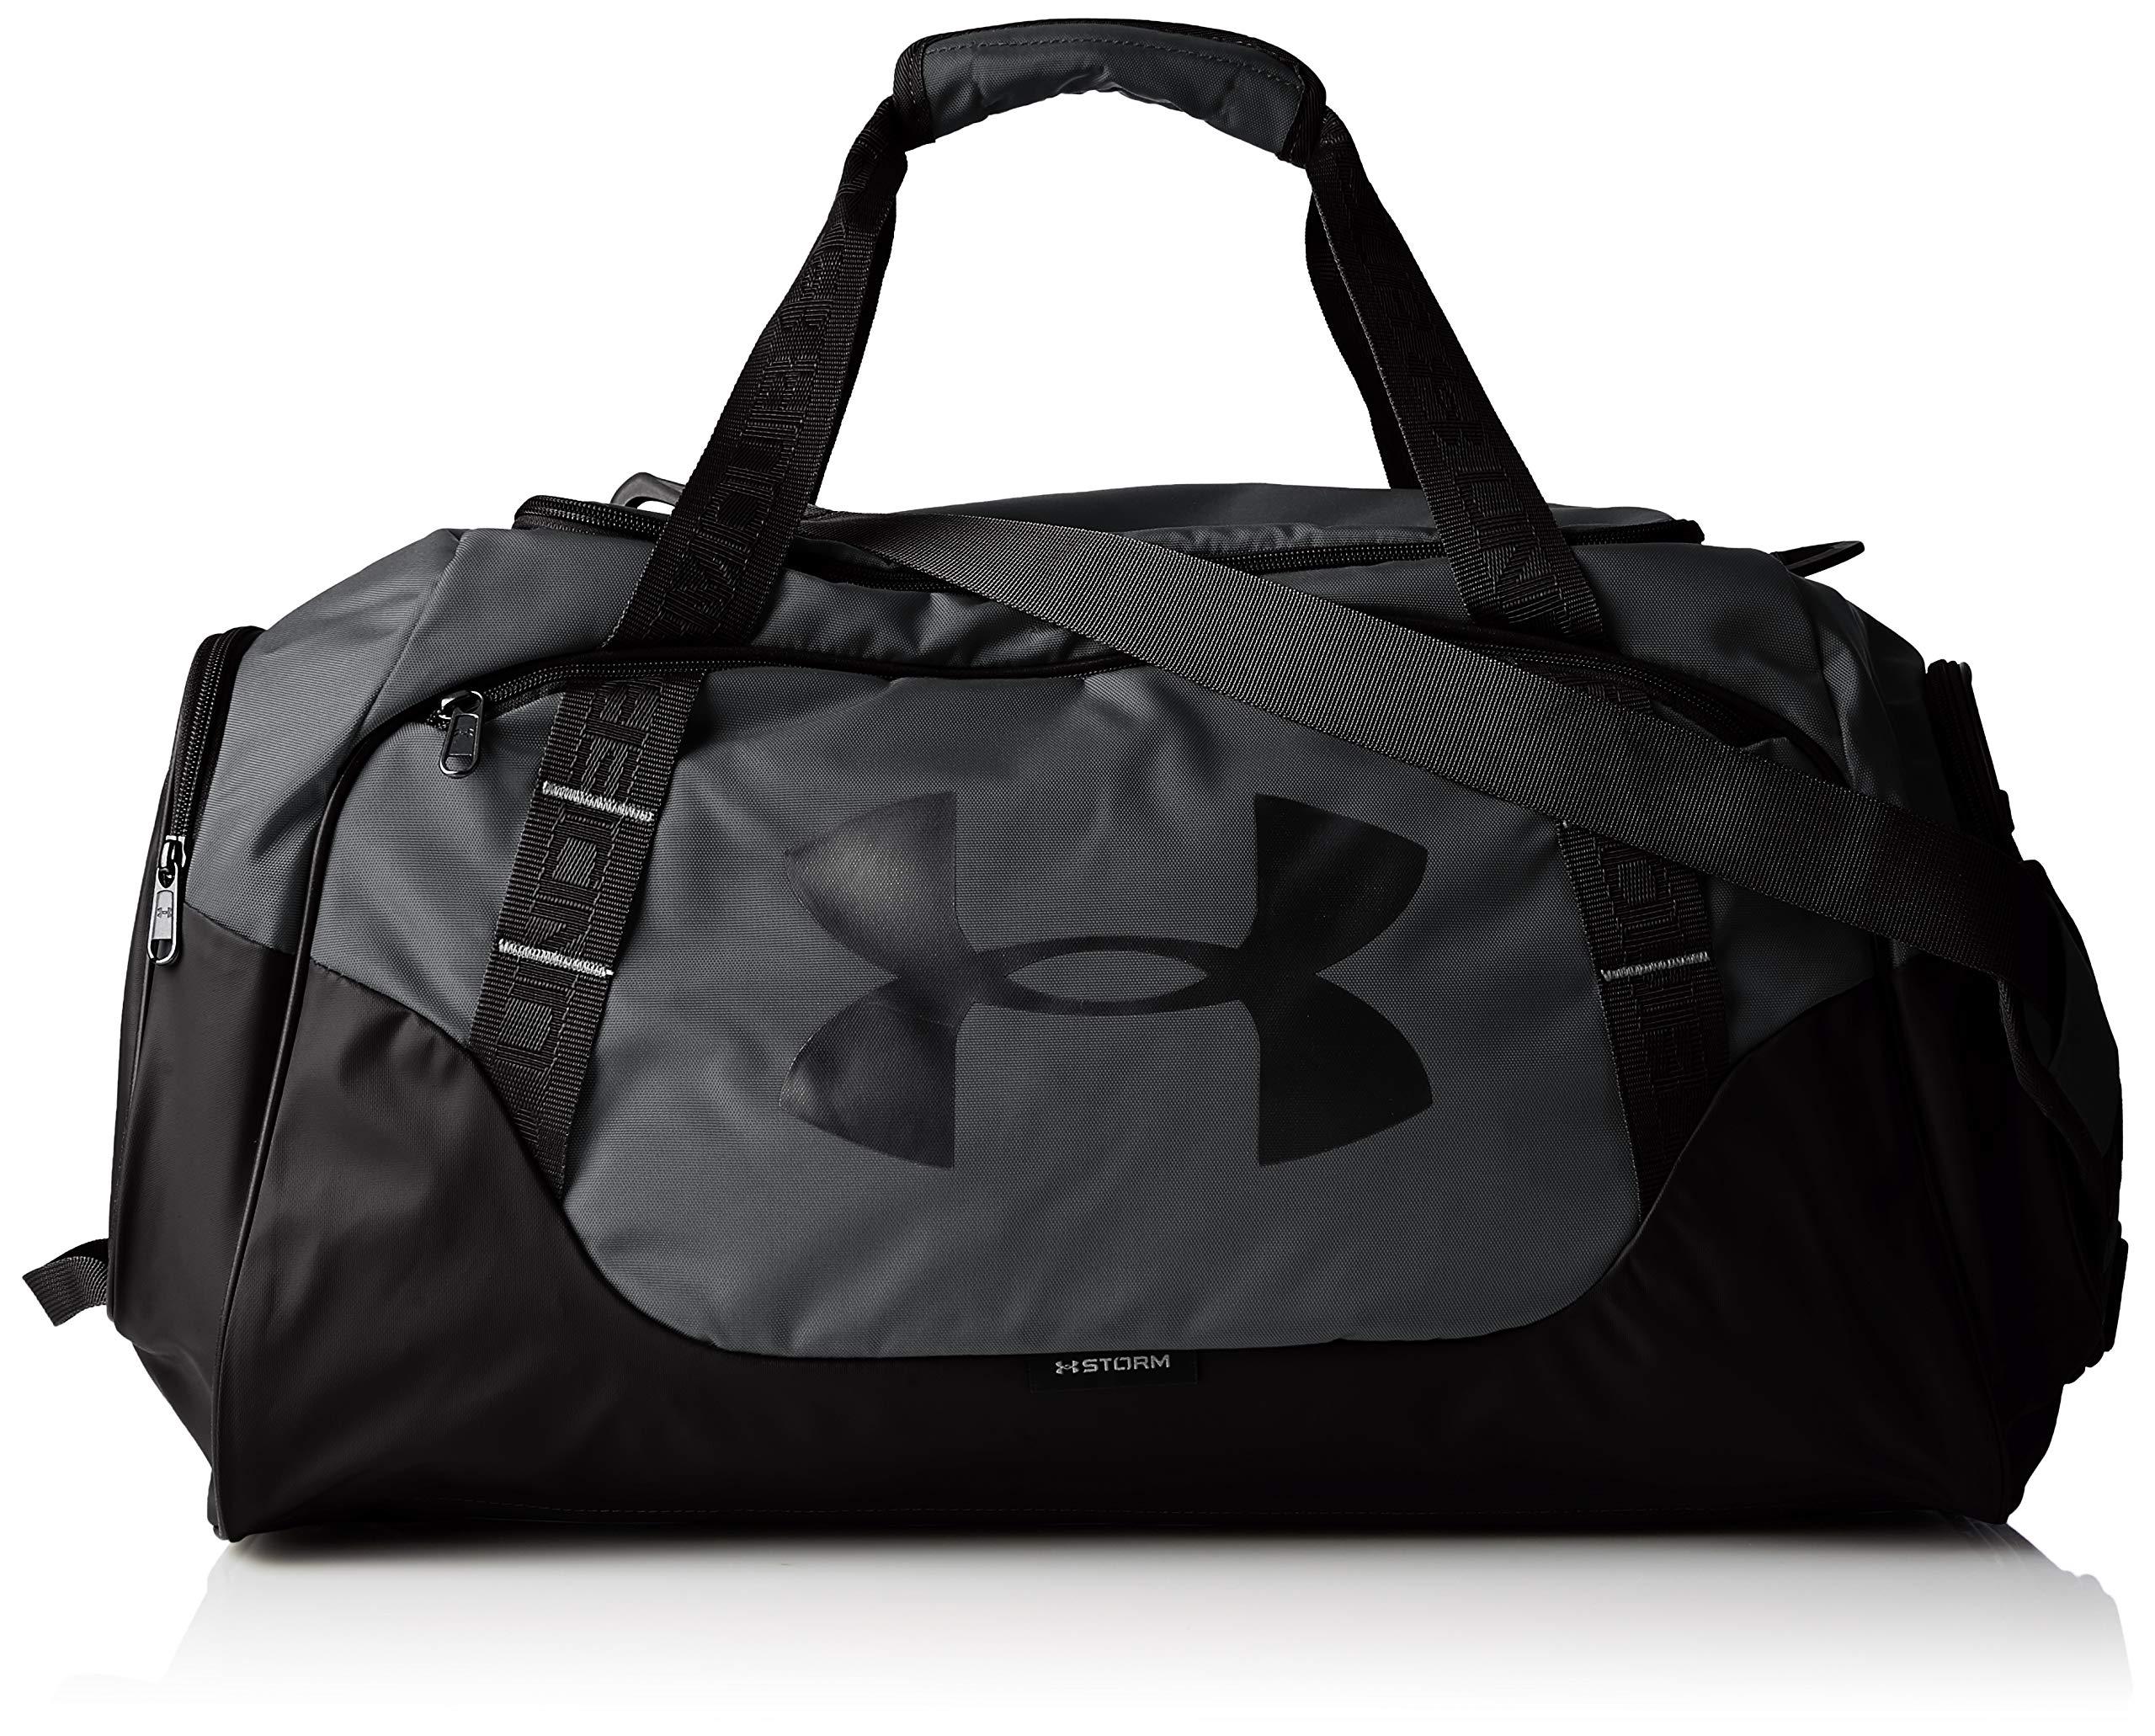 Under Armour Undeniable Duffle 3.0 Gym Bag, Graphite (040)/Black, Medium by Under Armour